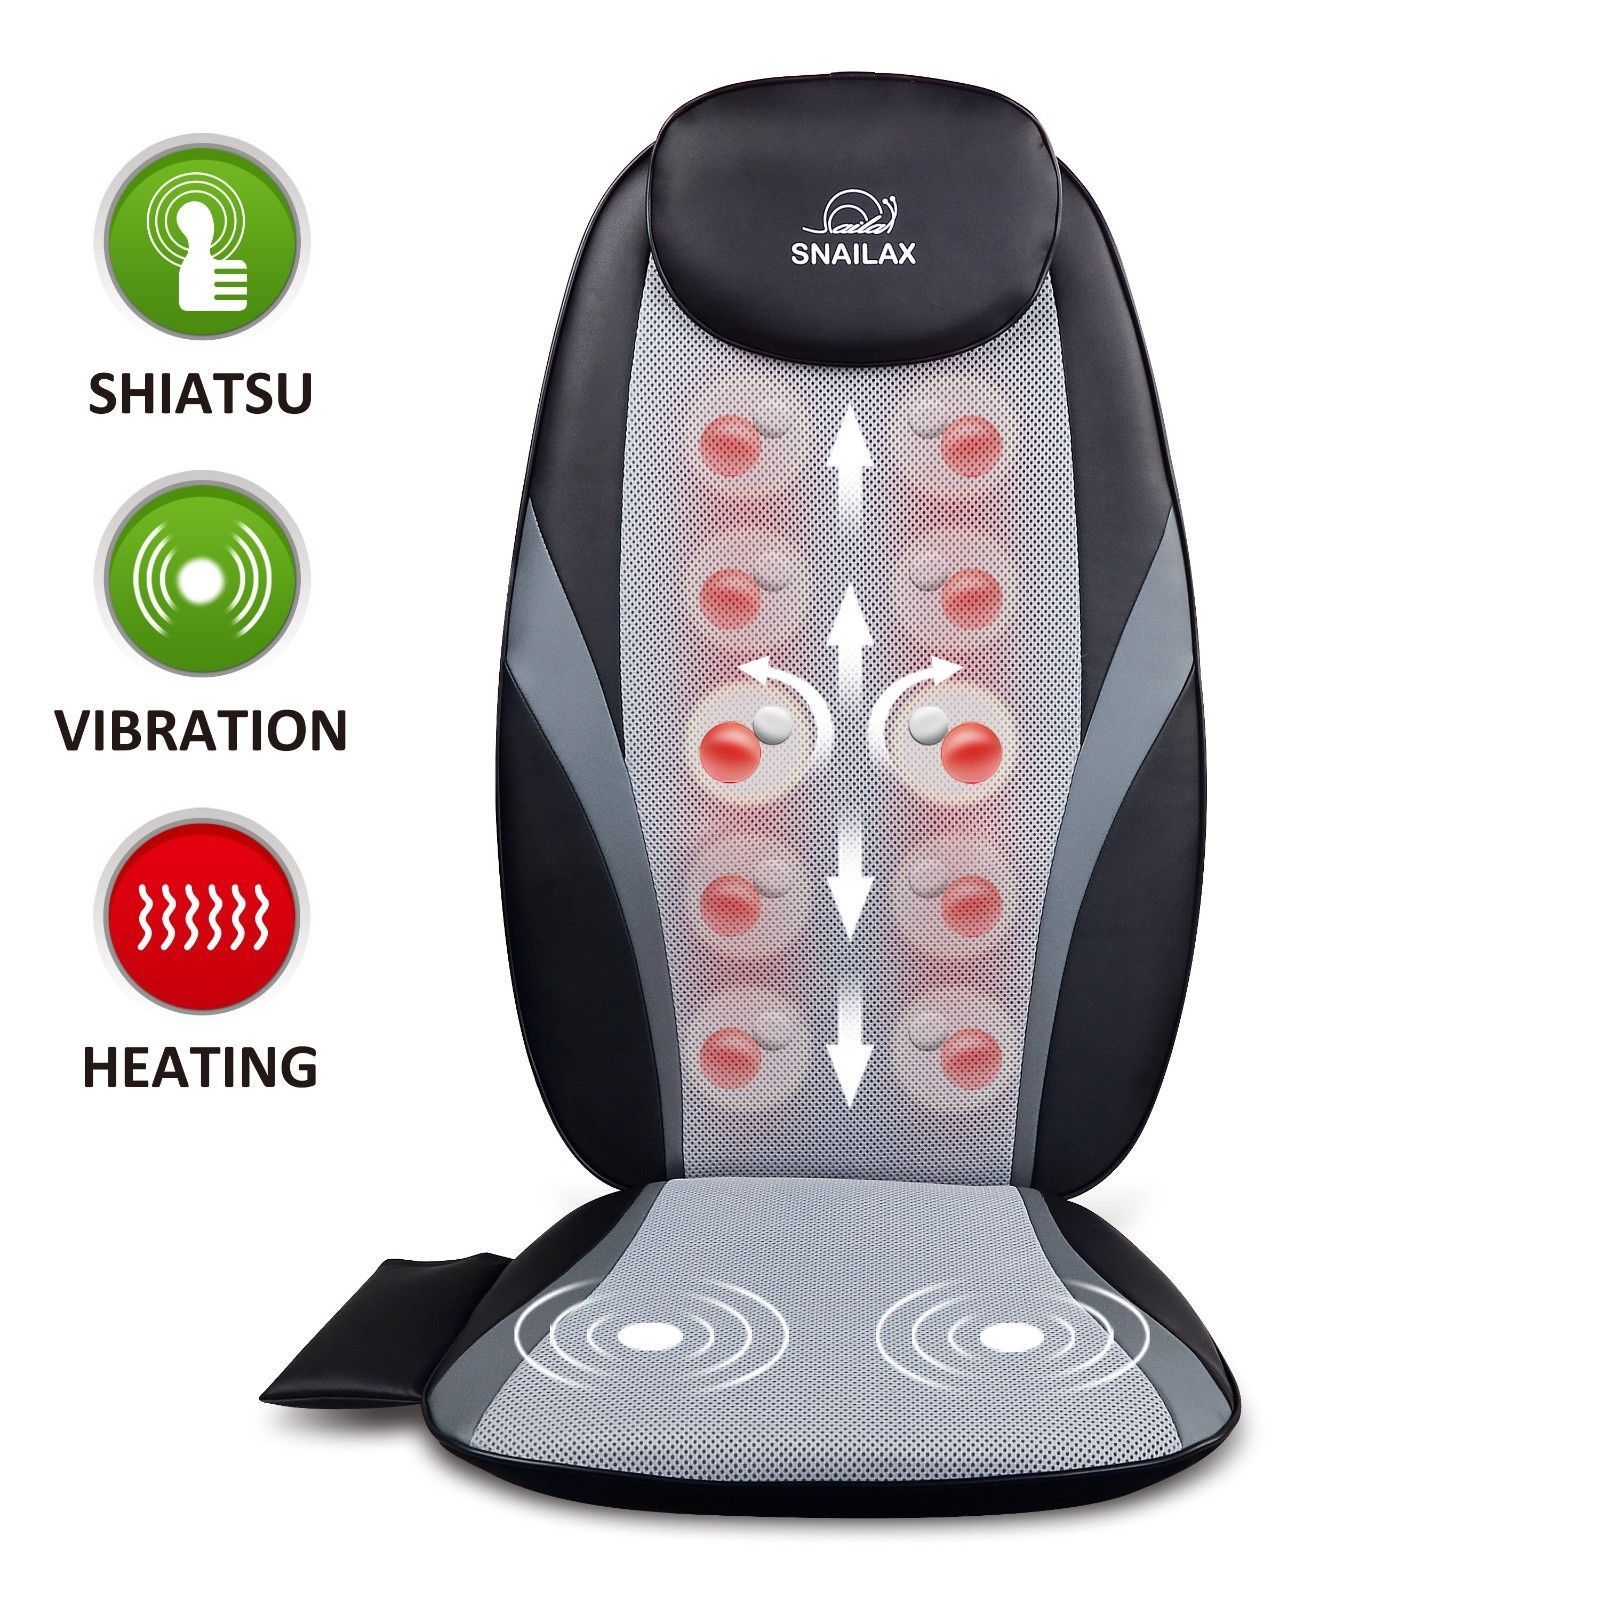 Shiatsu Massage Nodes For 3 Customized Massage Area Upper Back Lower Back Full Back Area Performs Deep Kneading Massagi Back Massager Shiatsu Shiatsu Massage